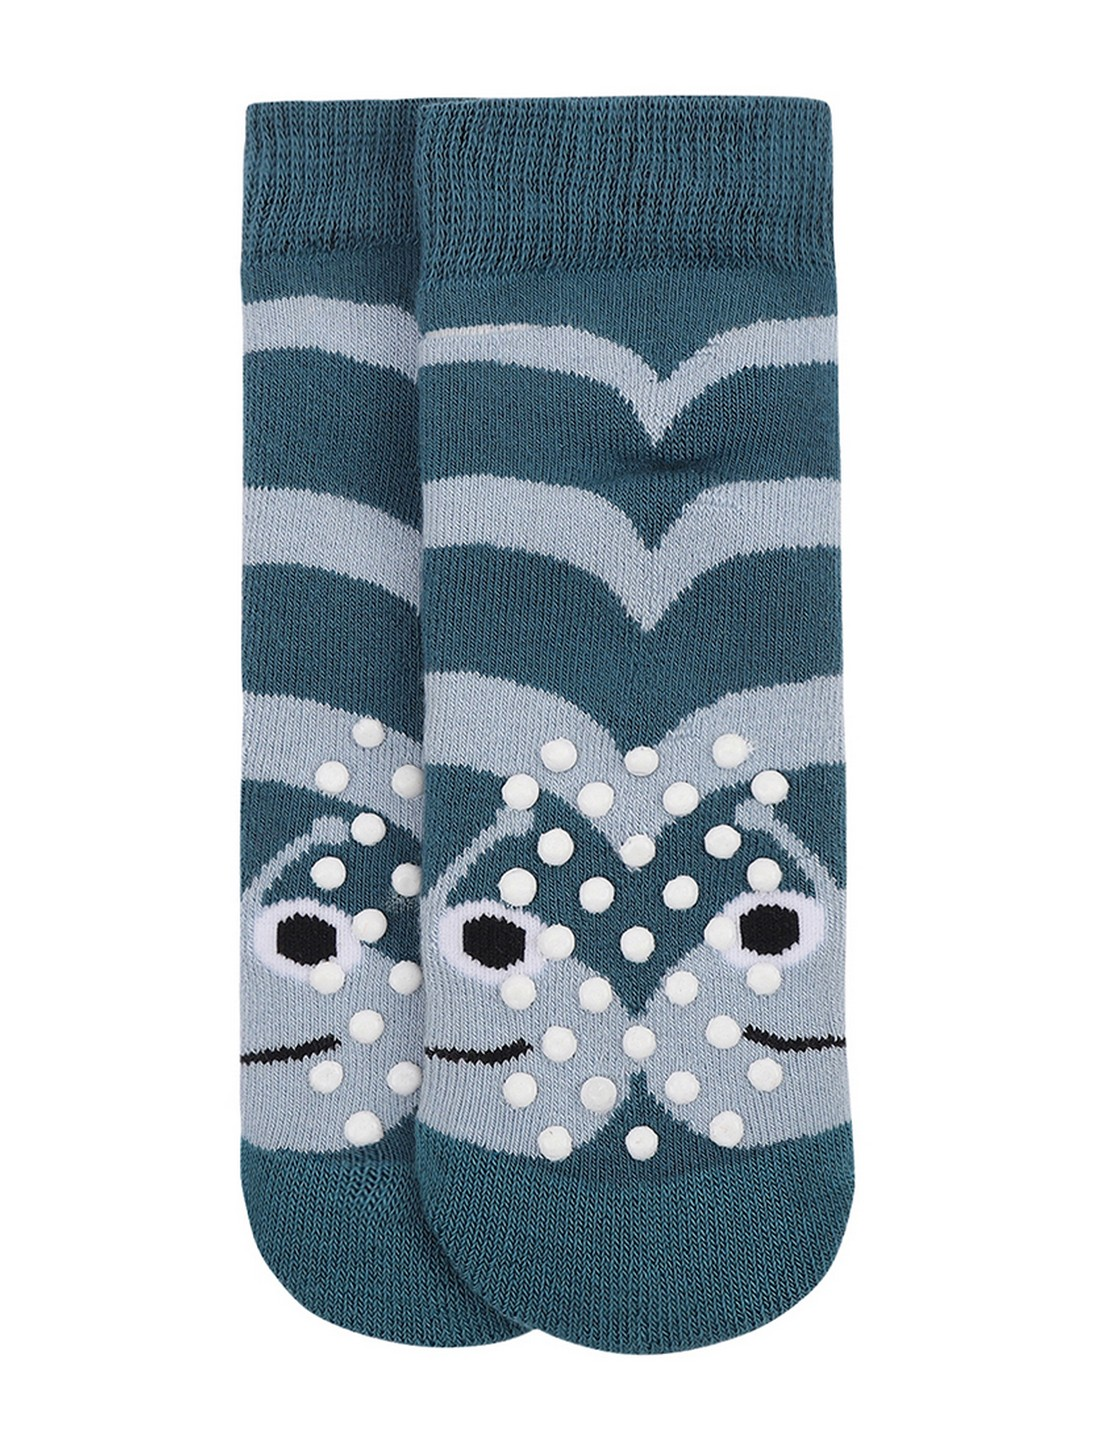 Soxytoes | Soxytoes Caterpillar Cotton Crew Length Blue Kids Socks-Age (0-2 Years)